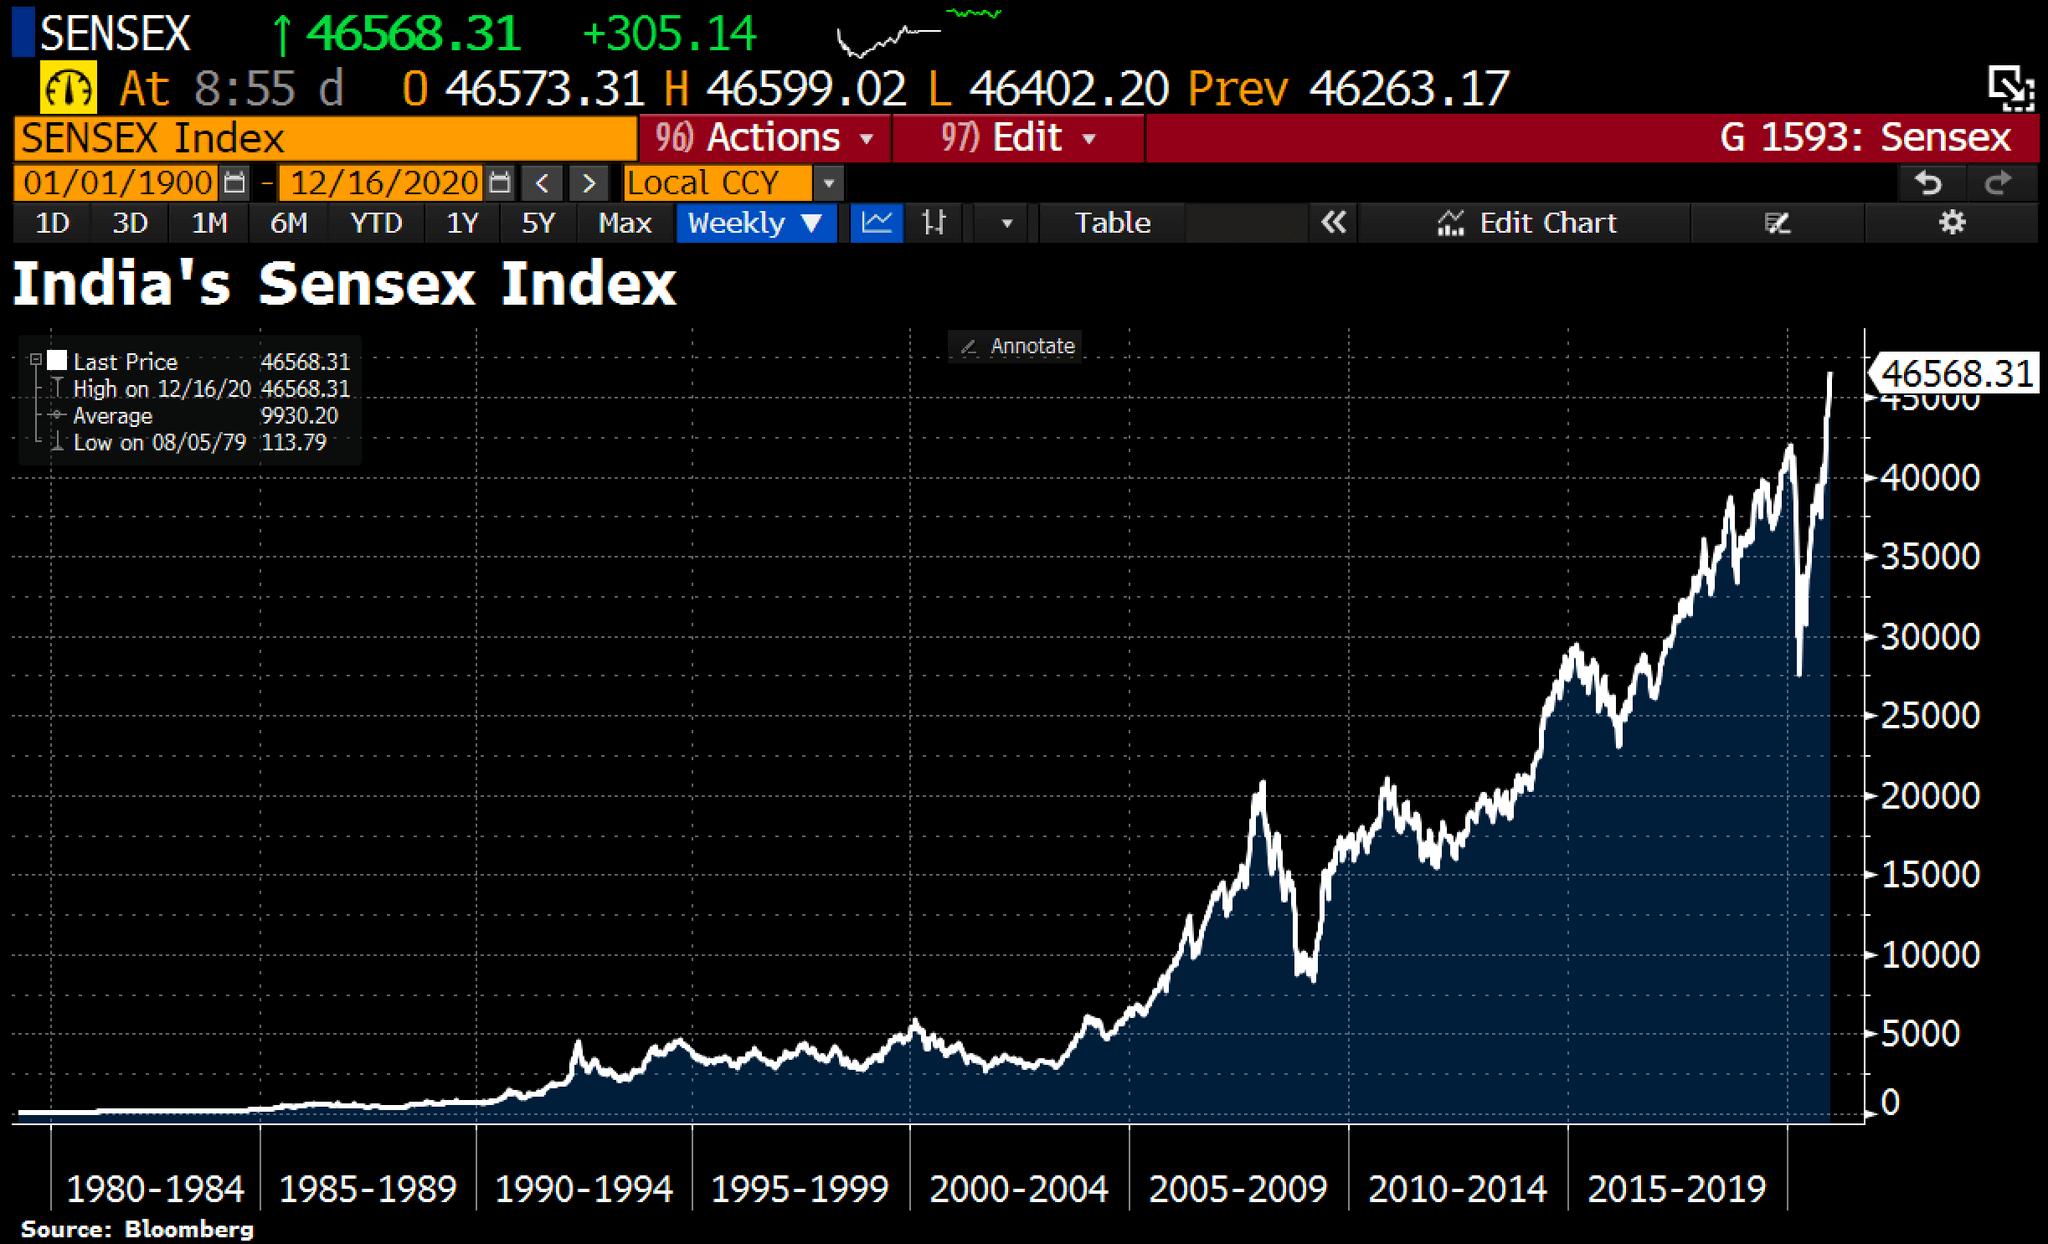 India's Sensex index to hit 50,000 - BNP Paribas